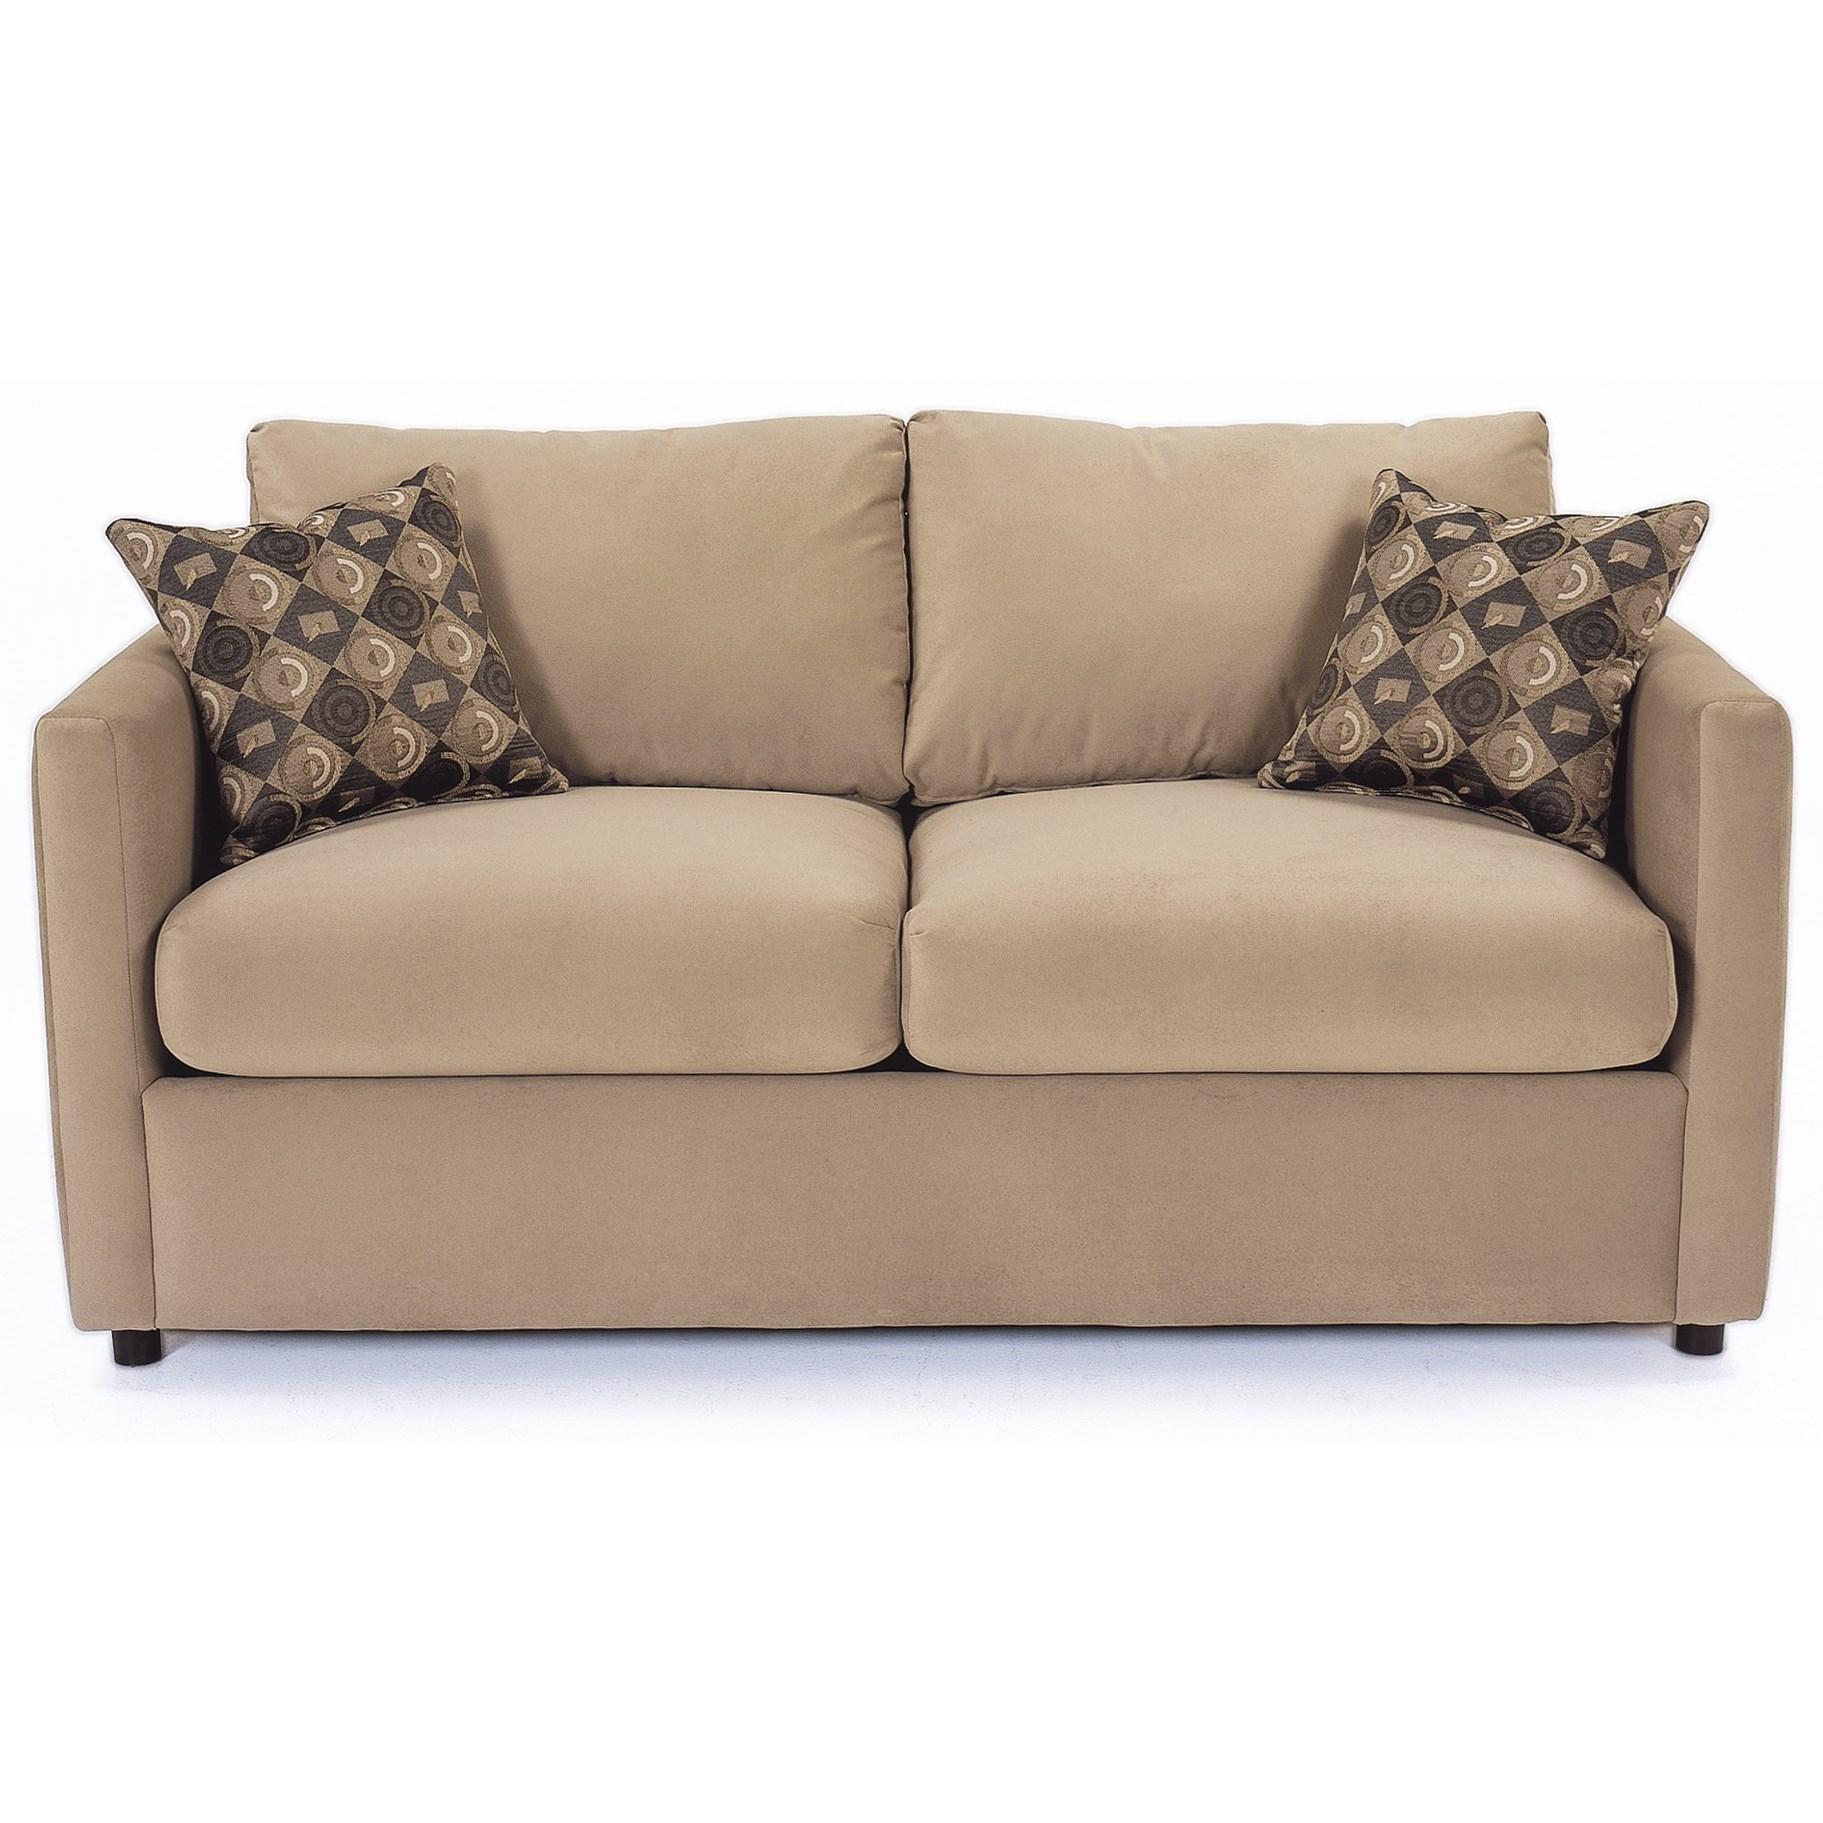 Stockdale Sleeper Sofa by Rowe at Baer's Furniture